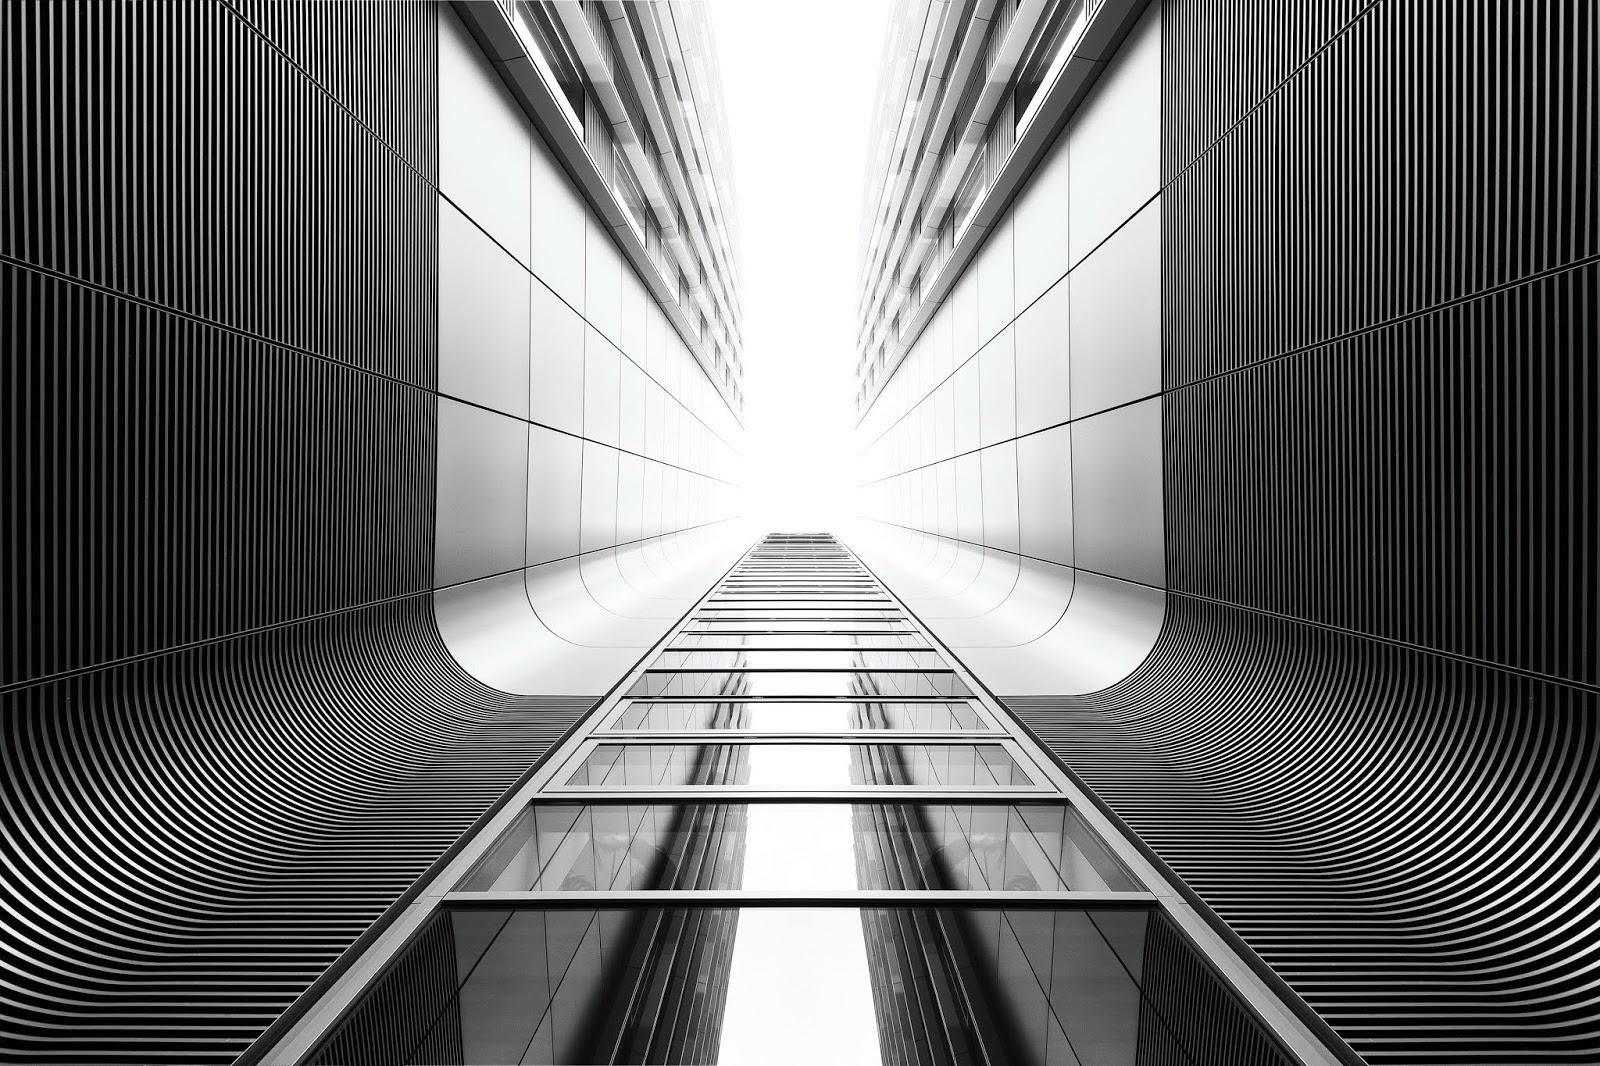 Architecture, Building, Monochrome, 4K, World